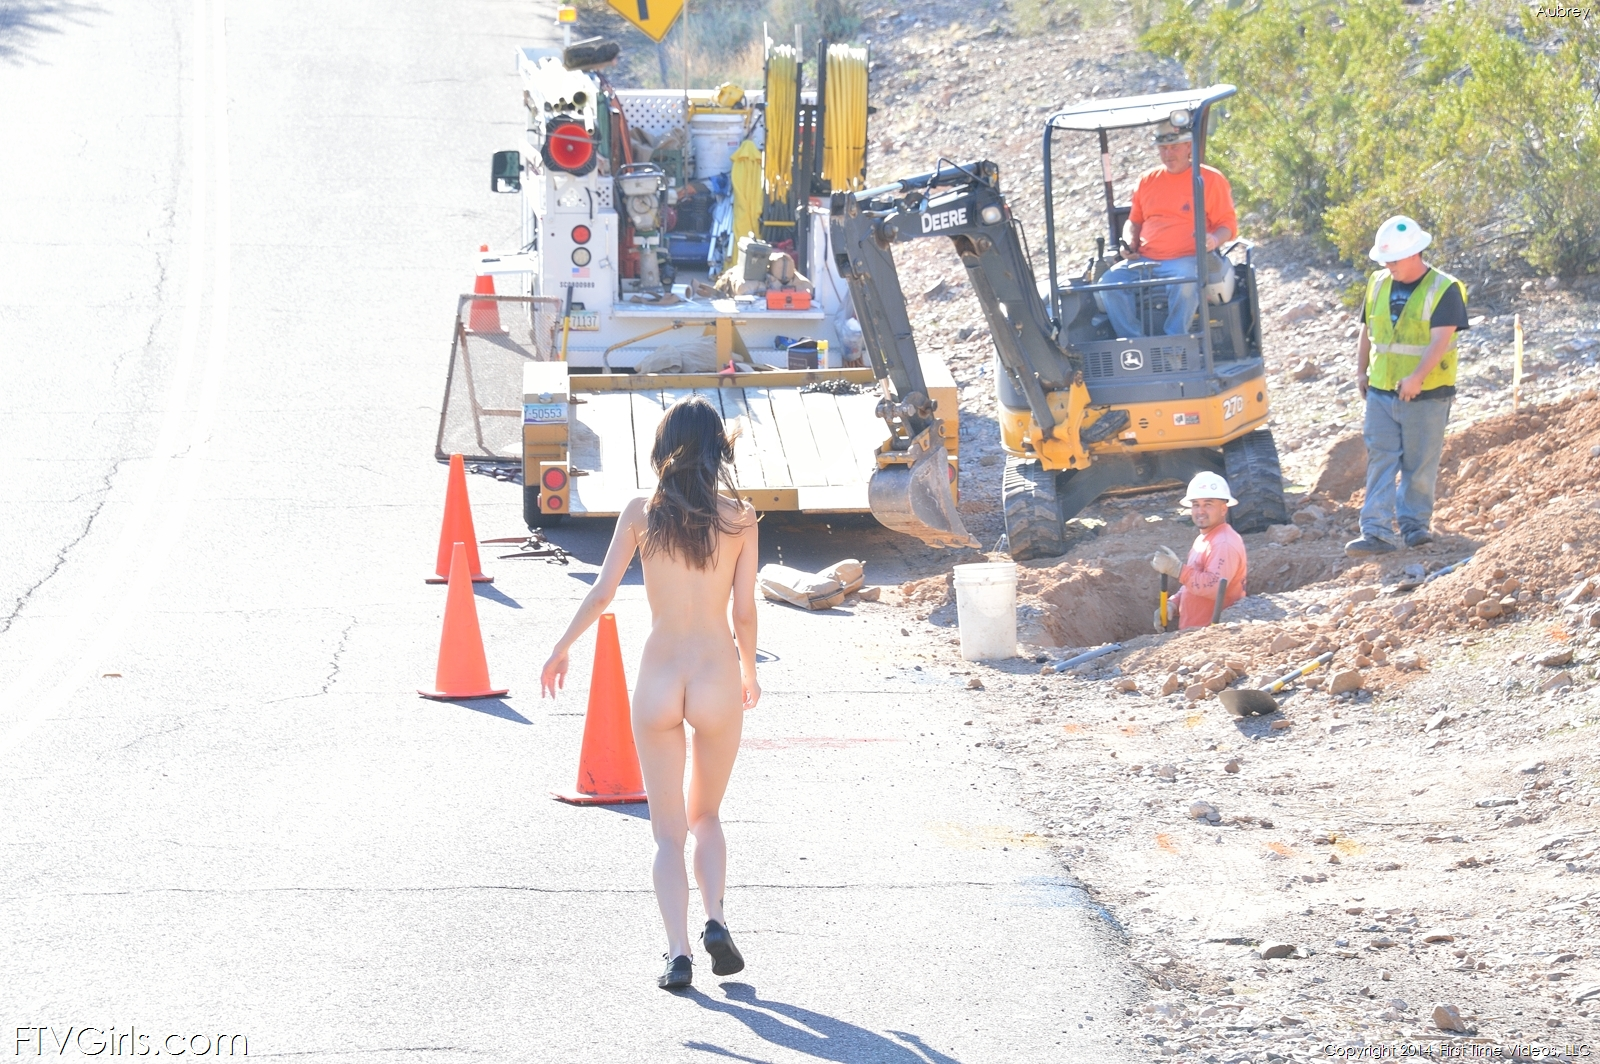 aubrey-shorts-nude-public-road-ftvgirls-21